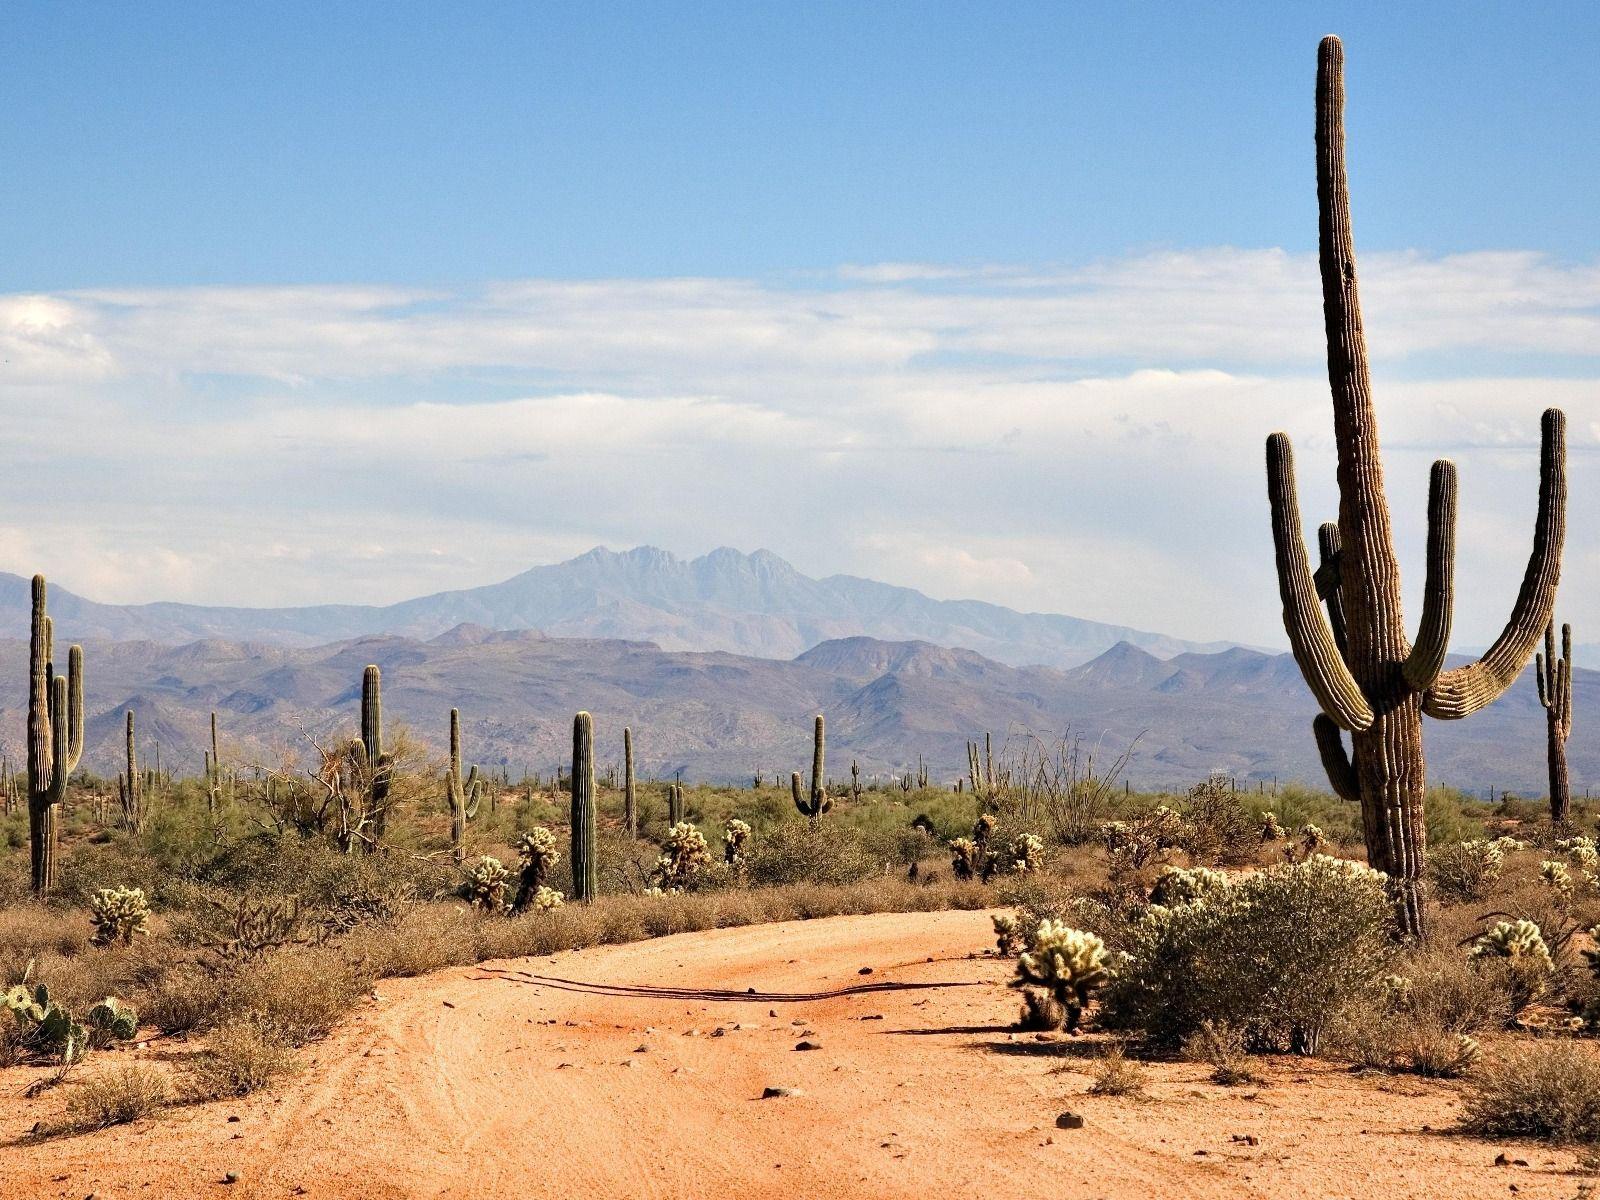 Sahara clipart desert mountain #3